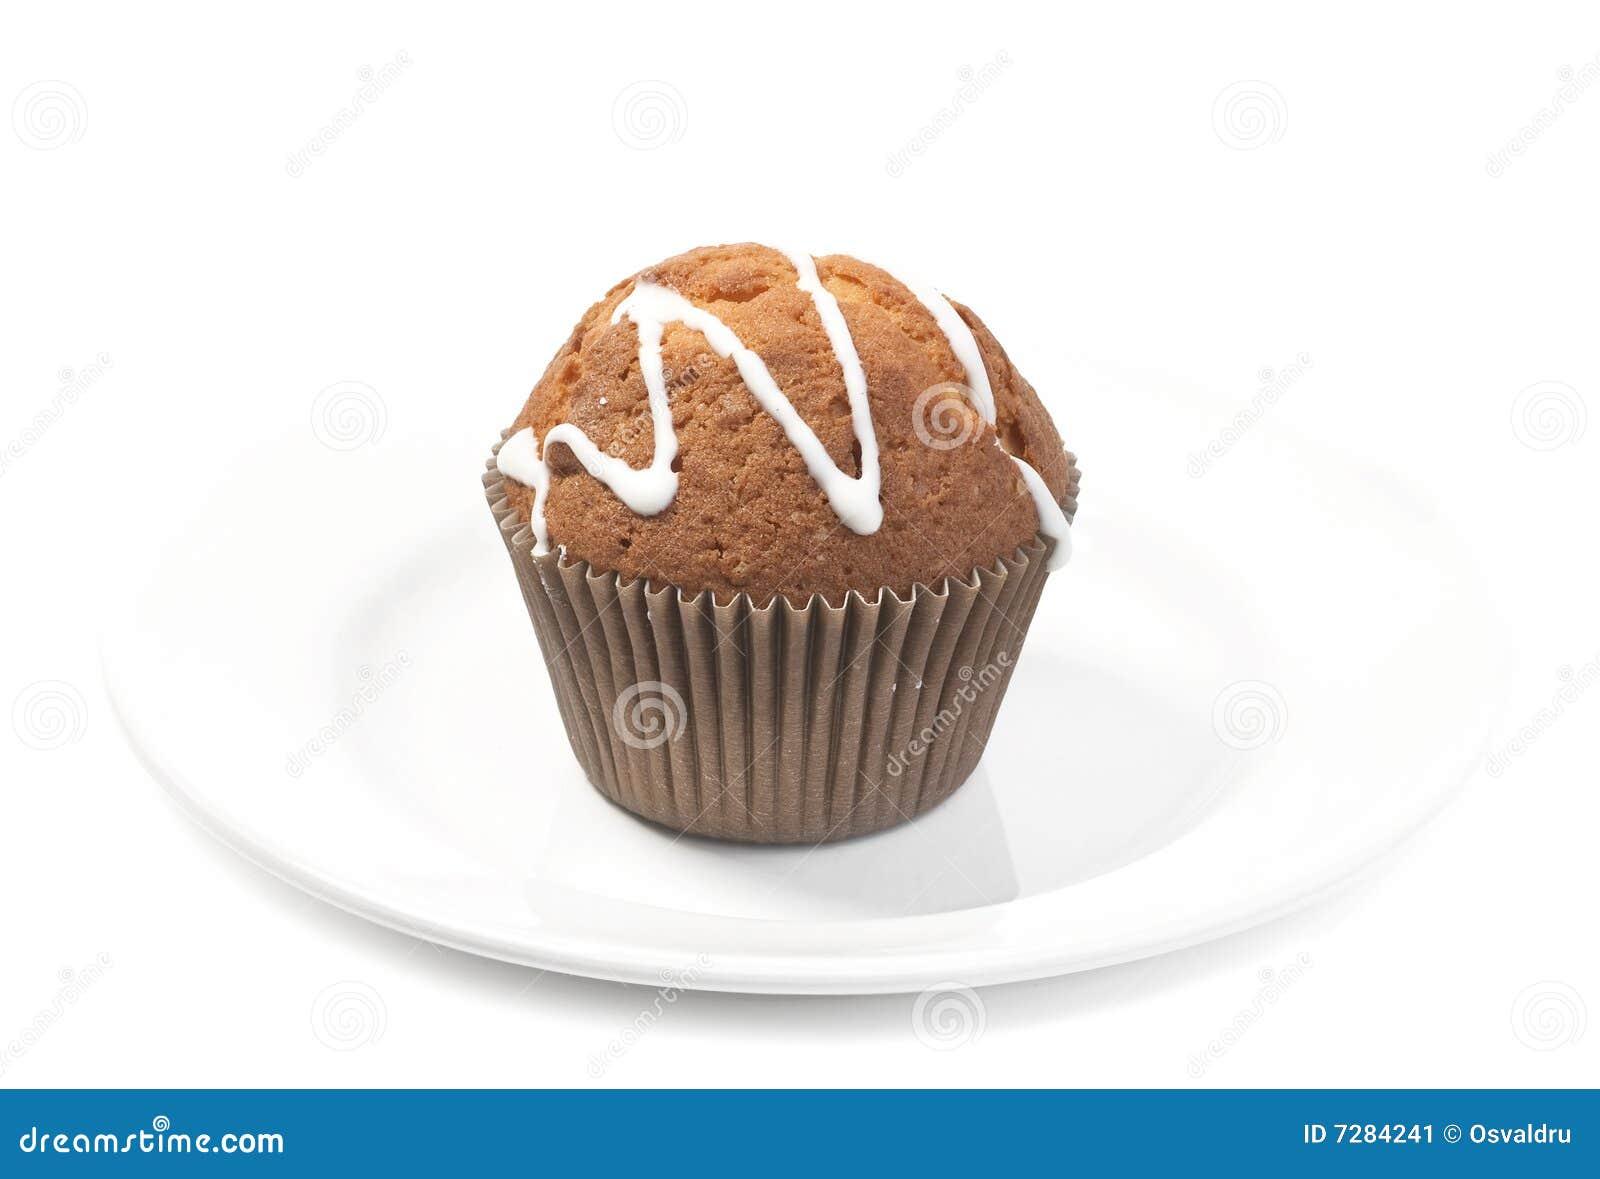 Foto de la torta helada dulce